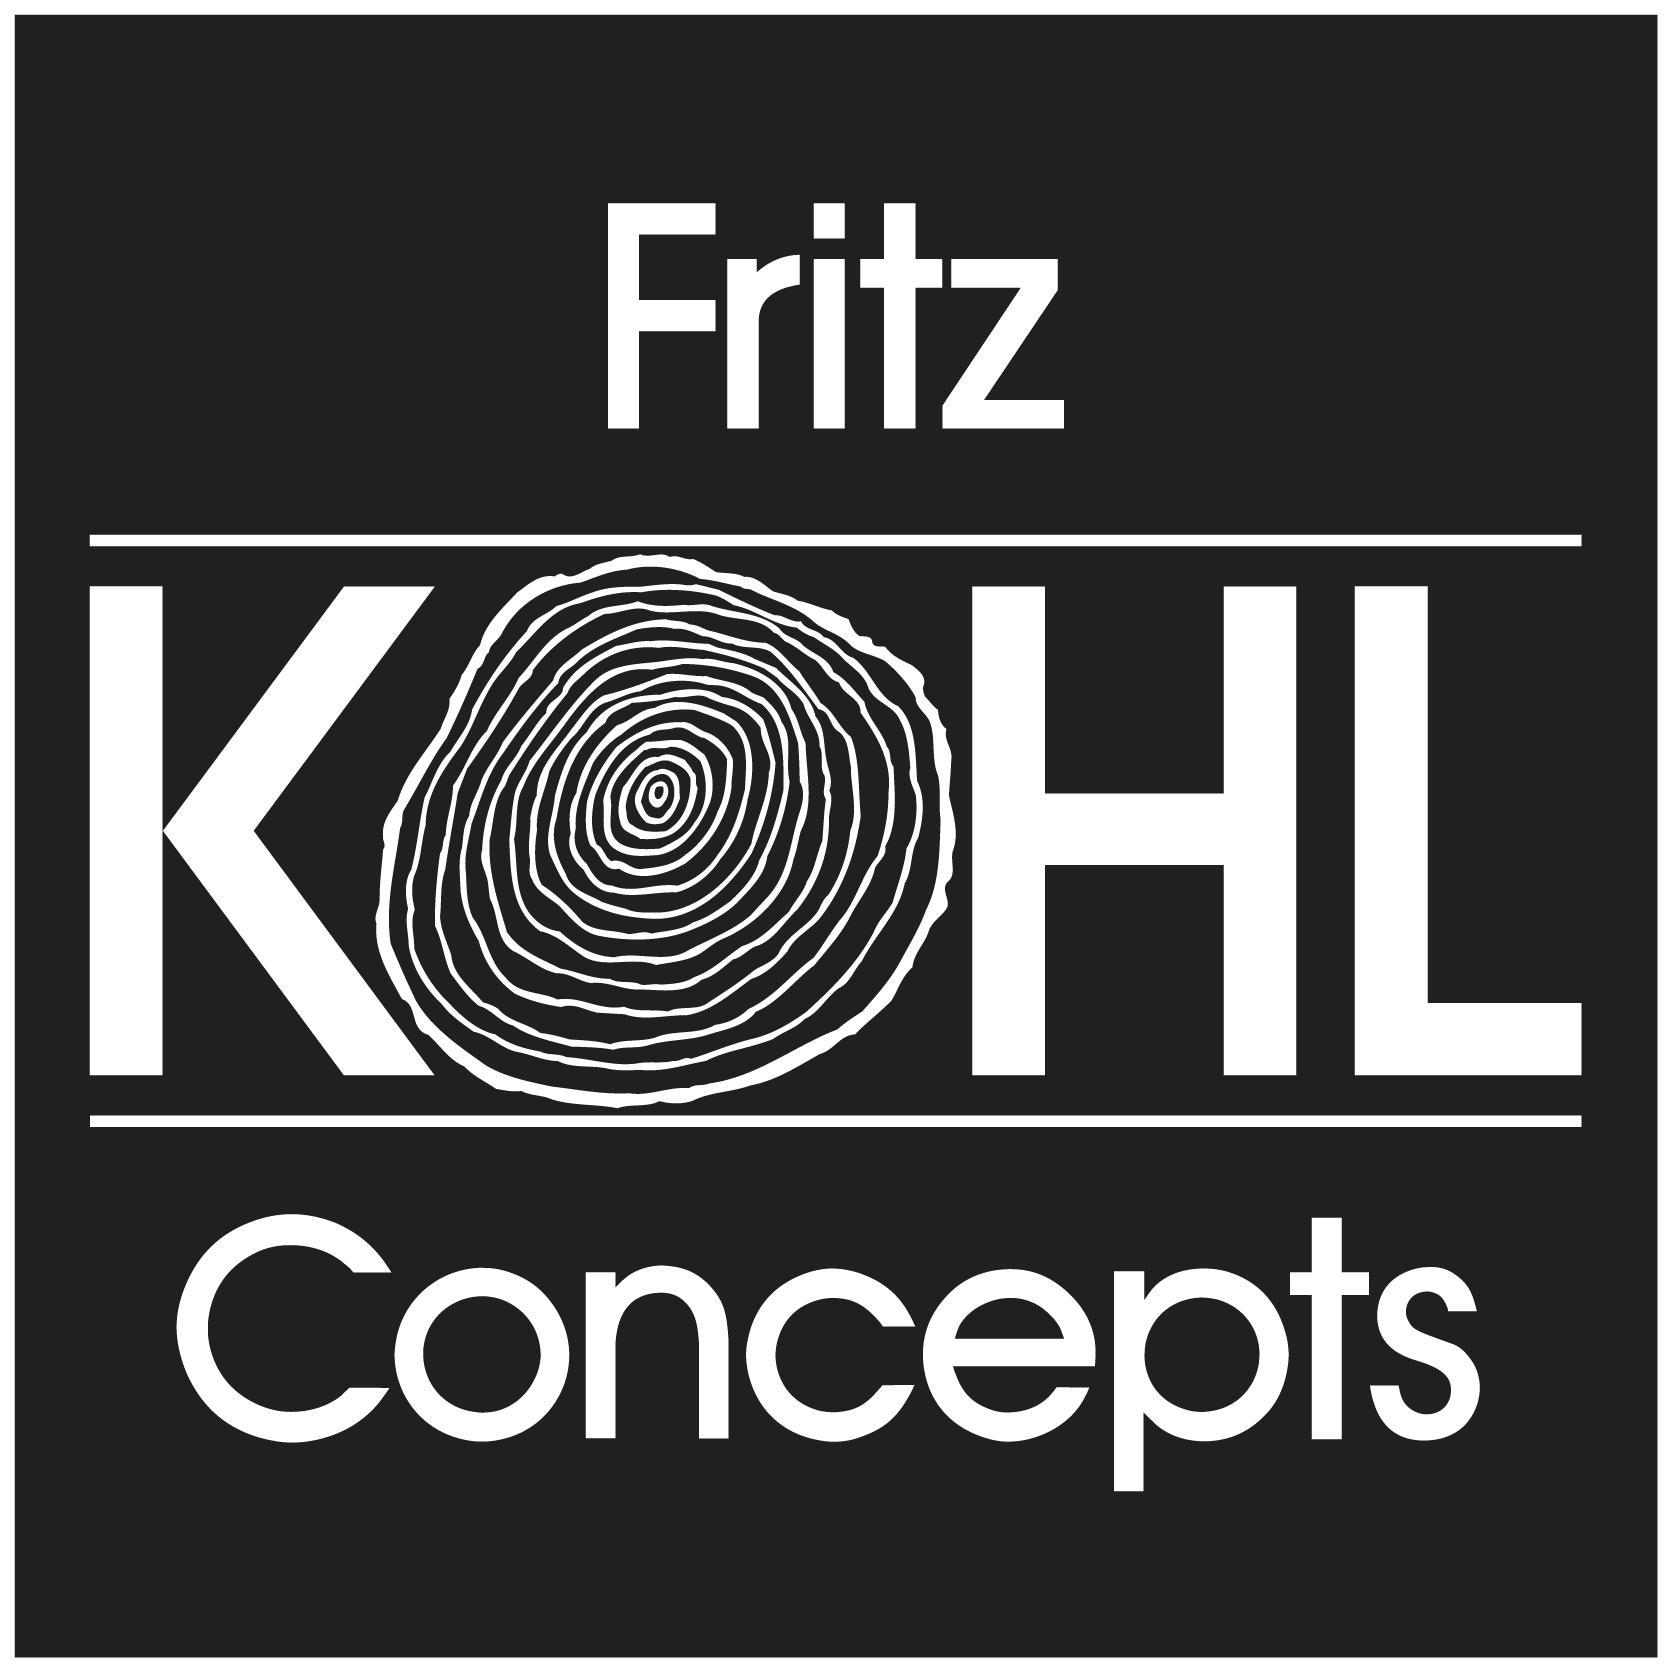 Fritz Kohl Concepts GmbH